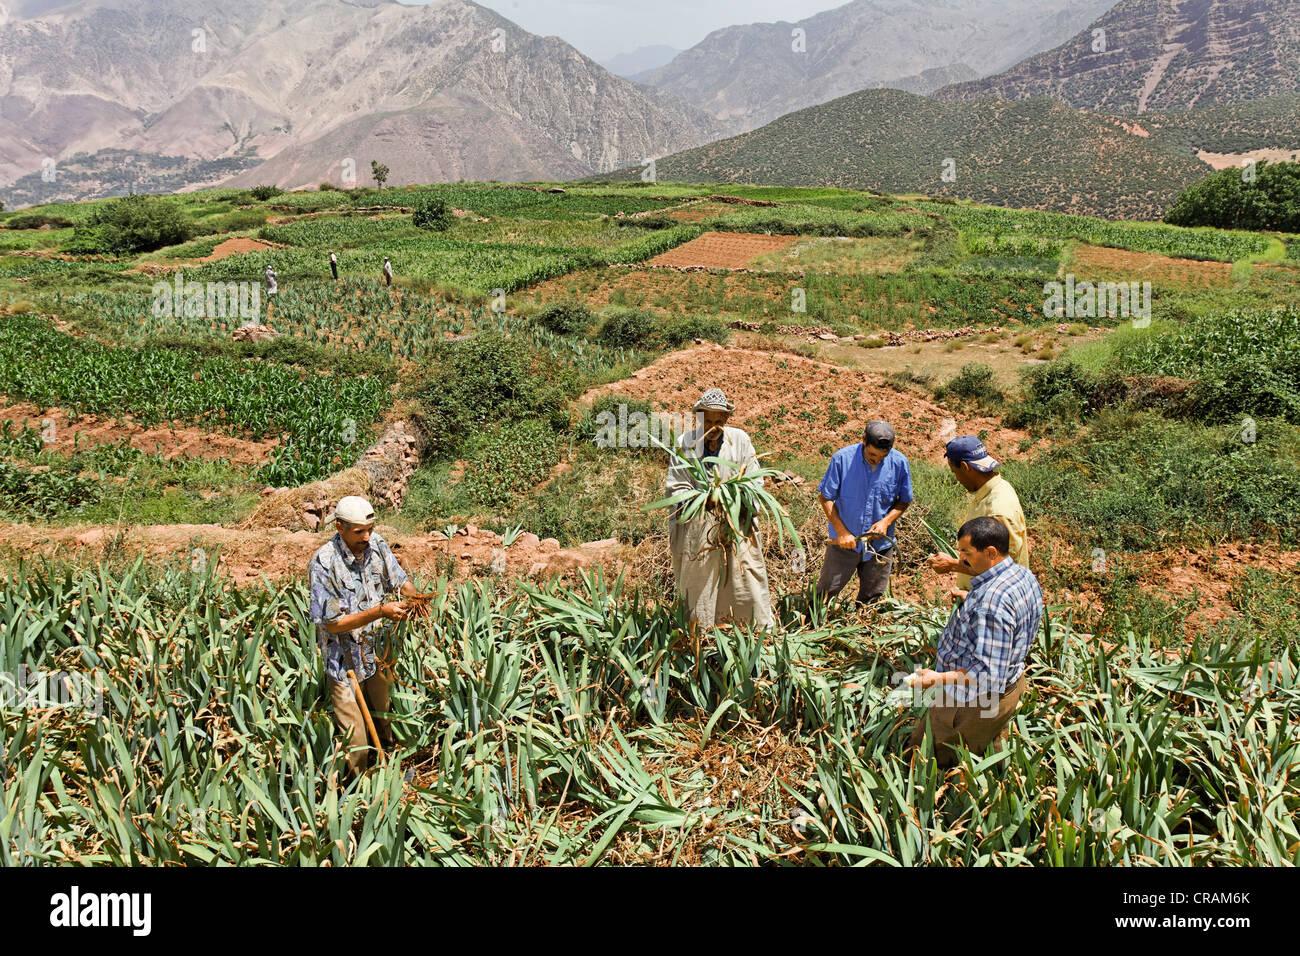 Group of men from Iwasoudane village harvesting the rhizomes of organically grown German Irises (Iris germanica) - Stock Image